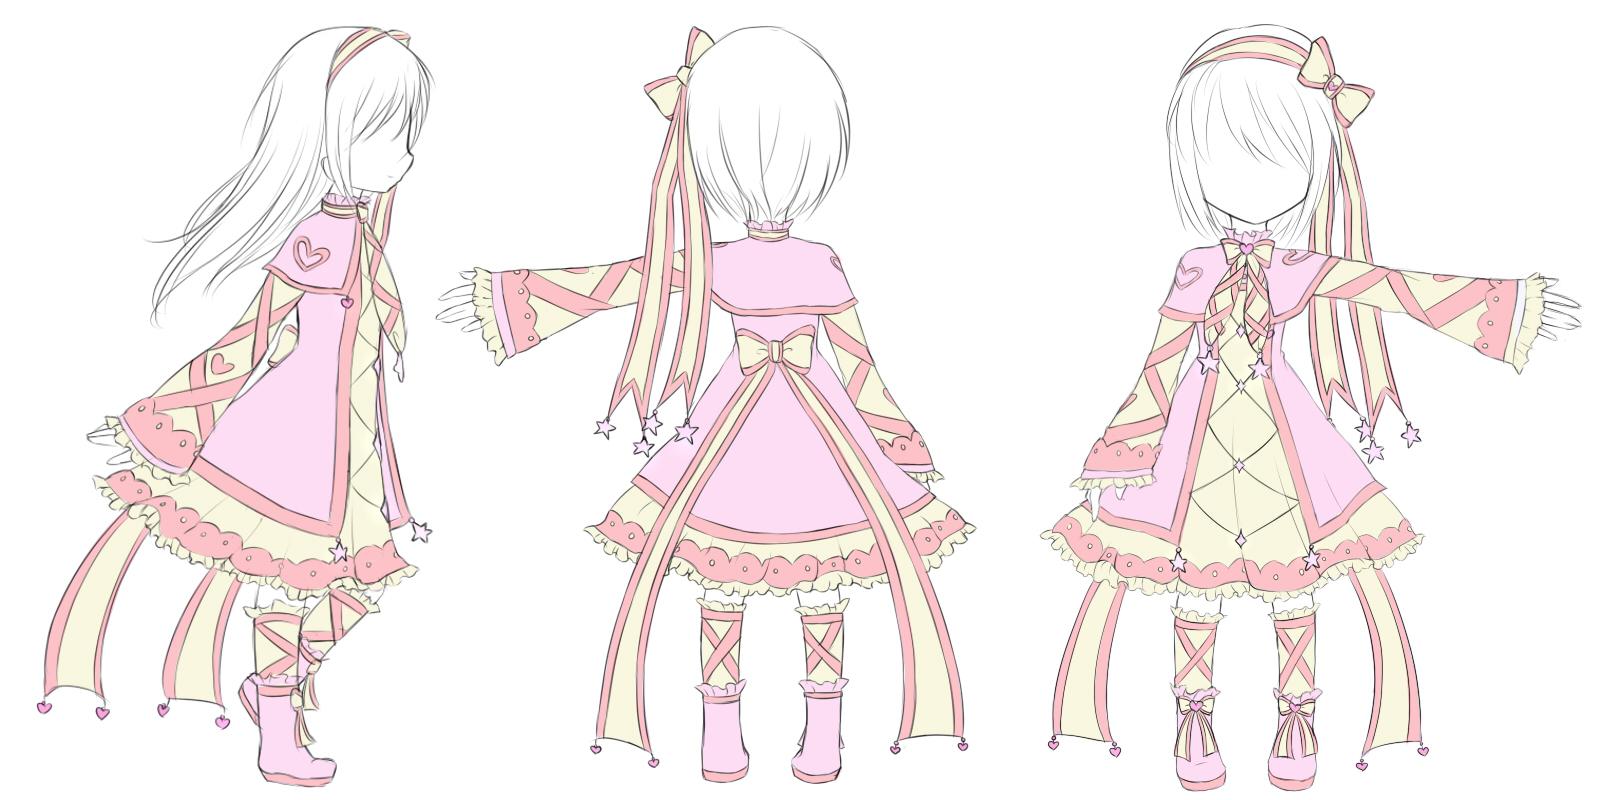 ll_set_pink_edit_schema_by_mimikuchair-d